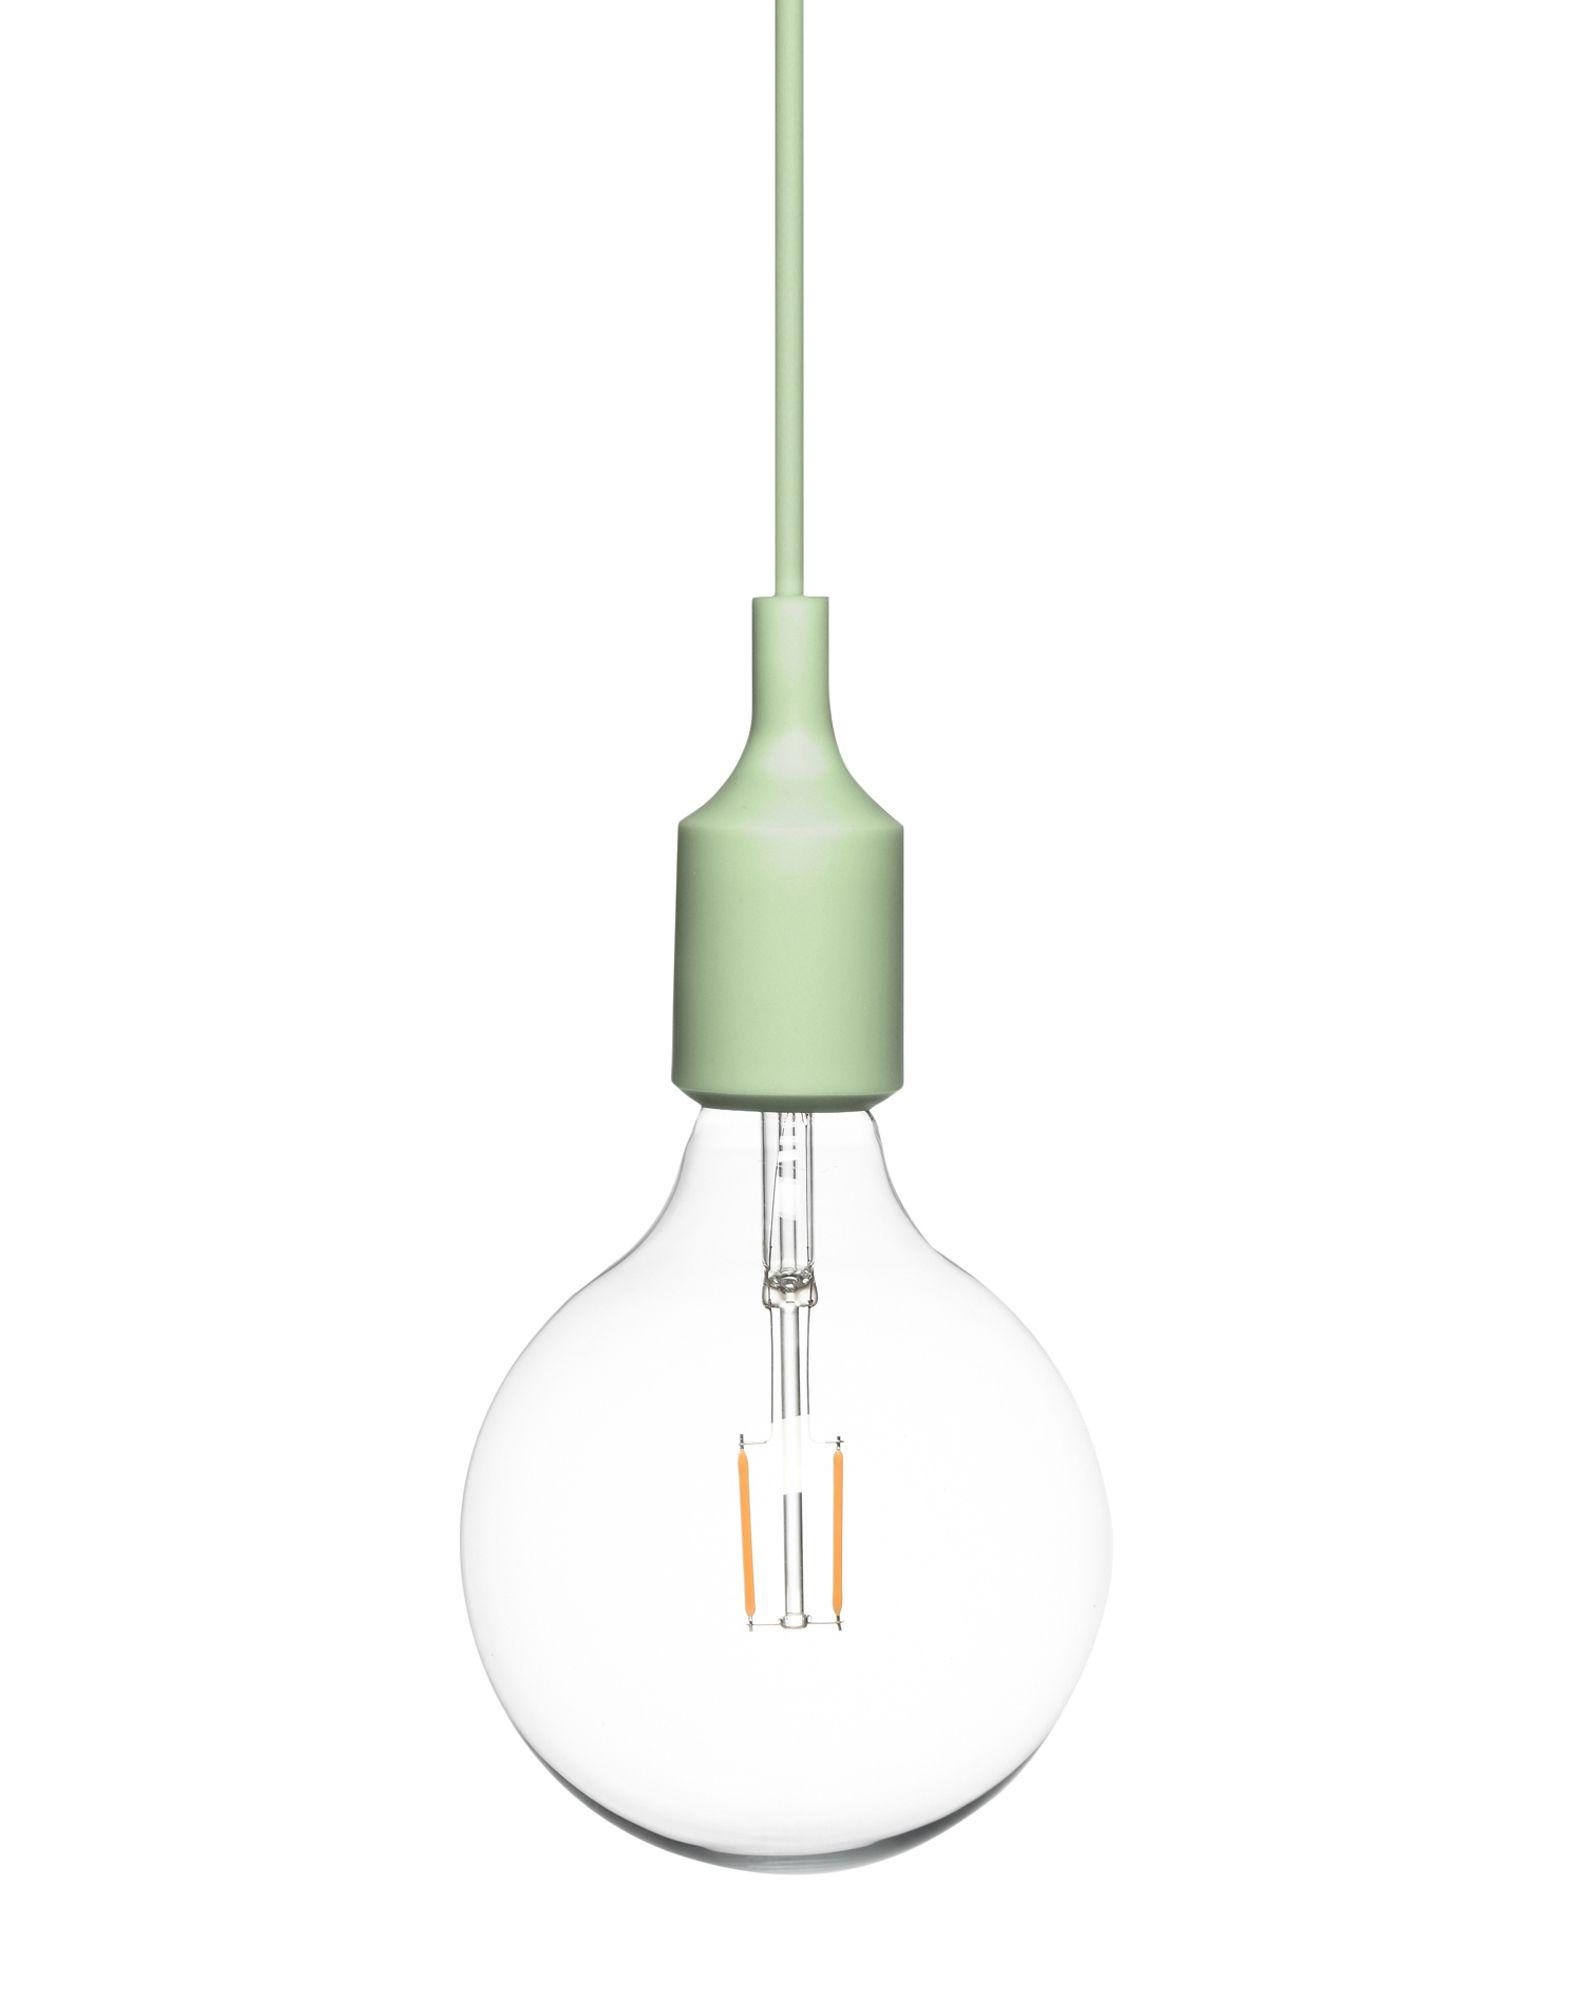 MUUTO Подвесная лампа muuto предмет сервировки стола